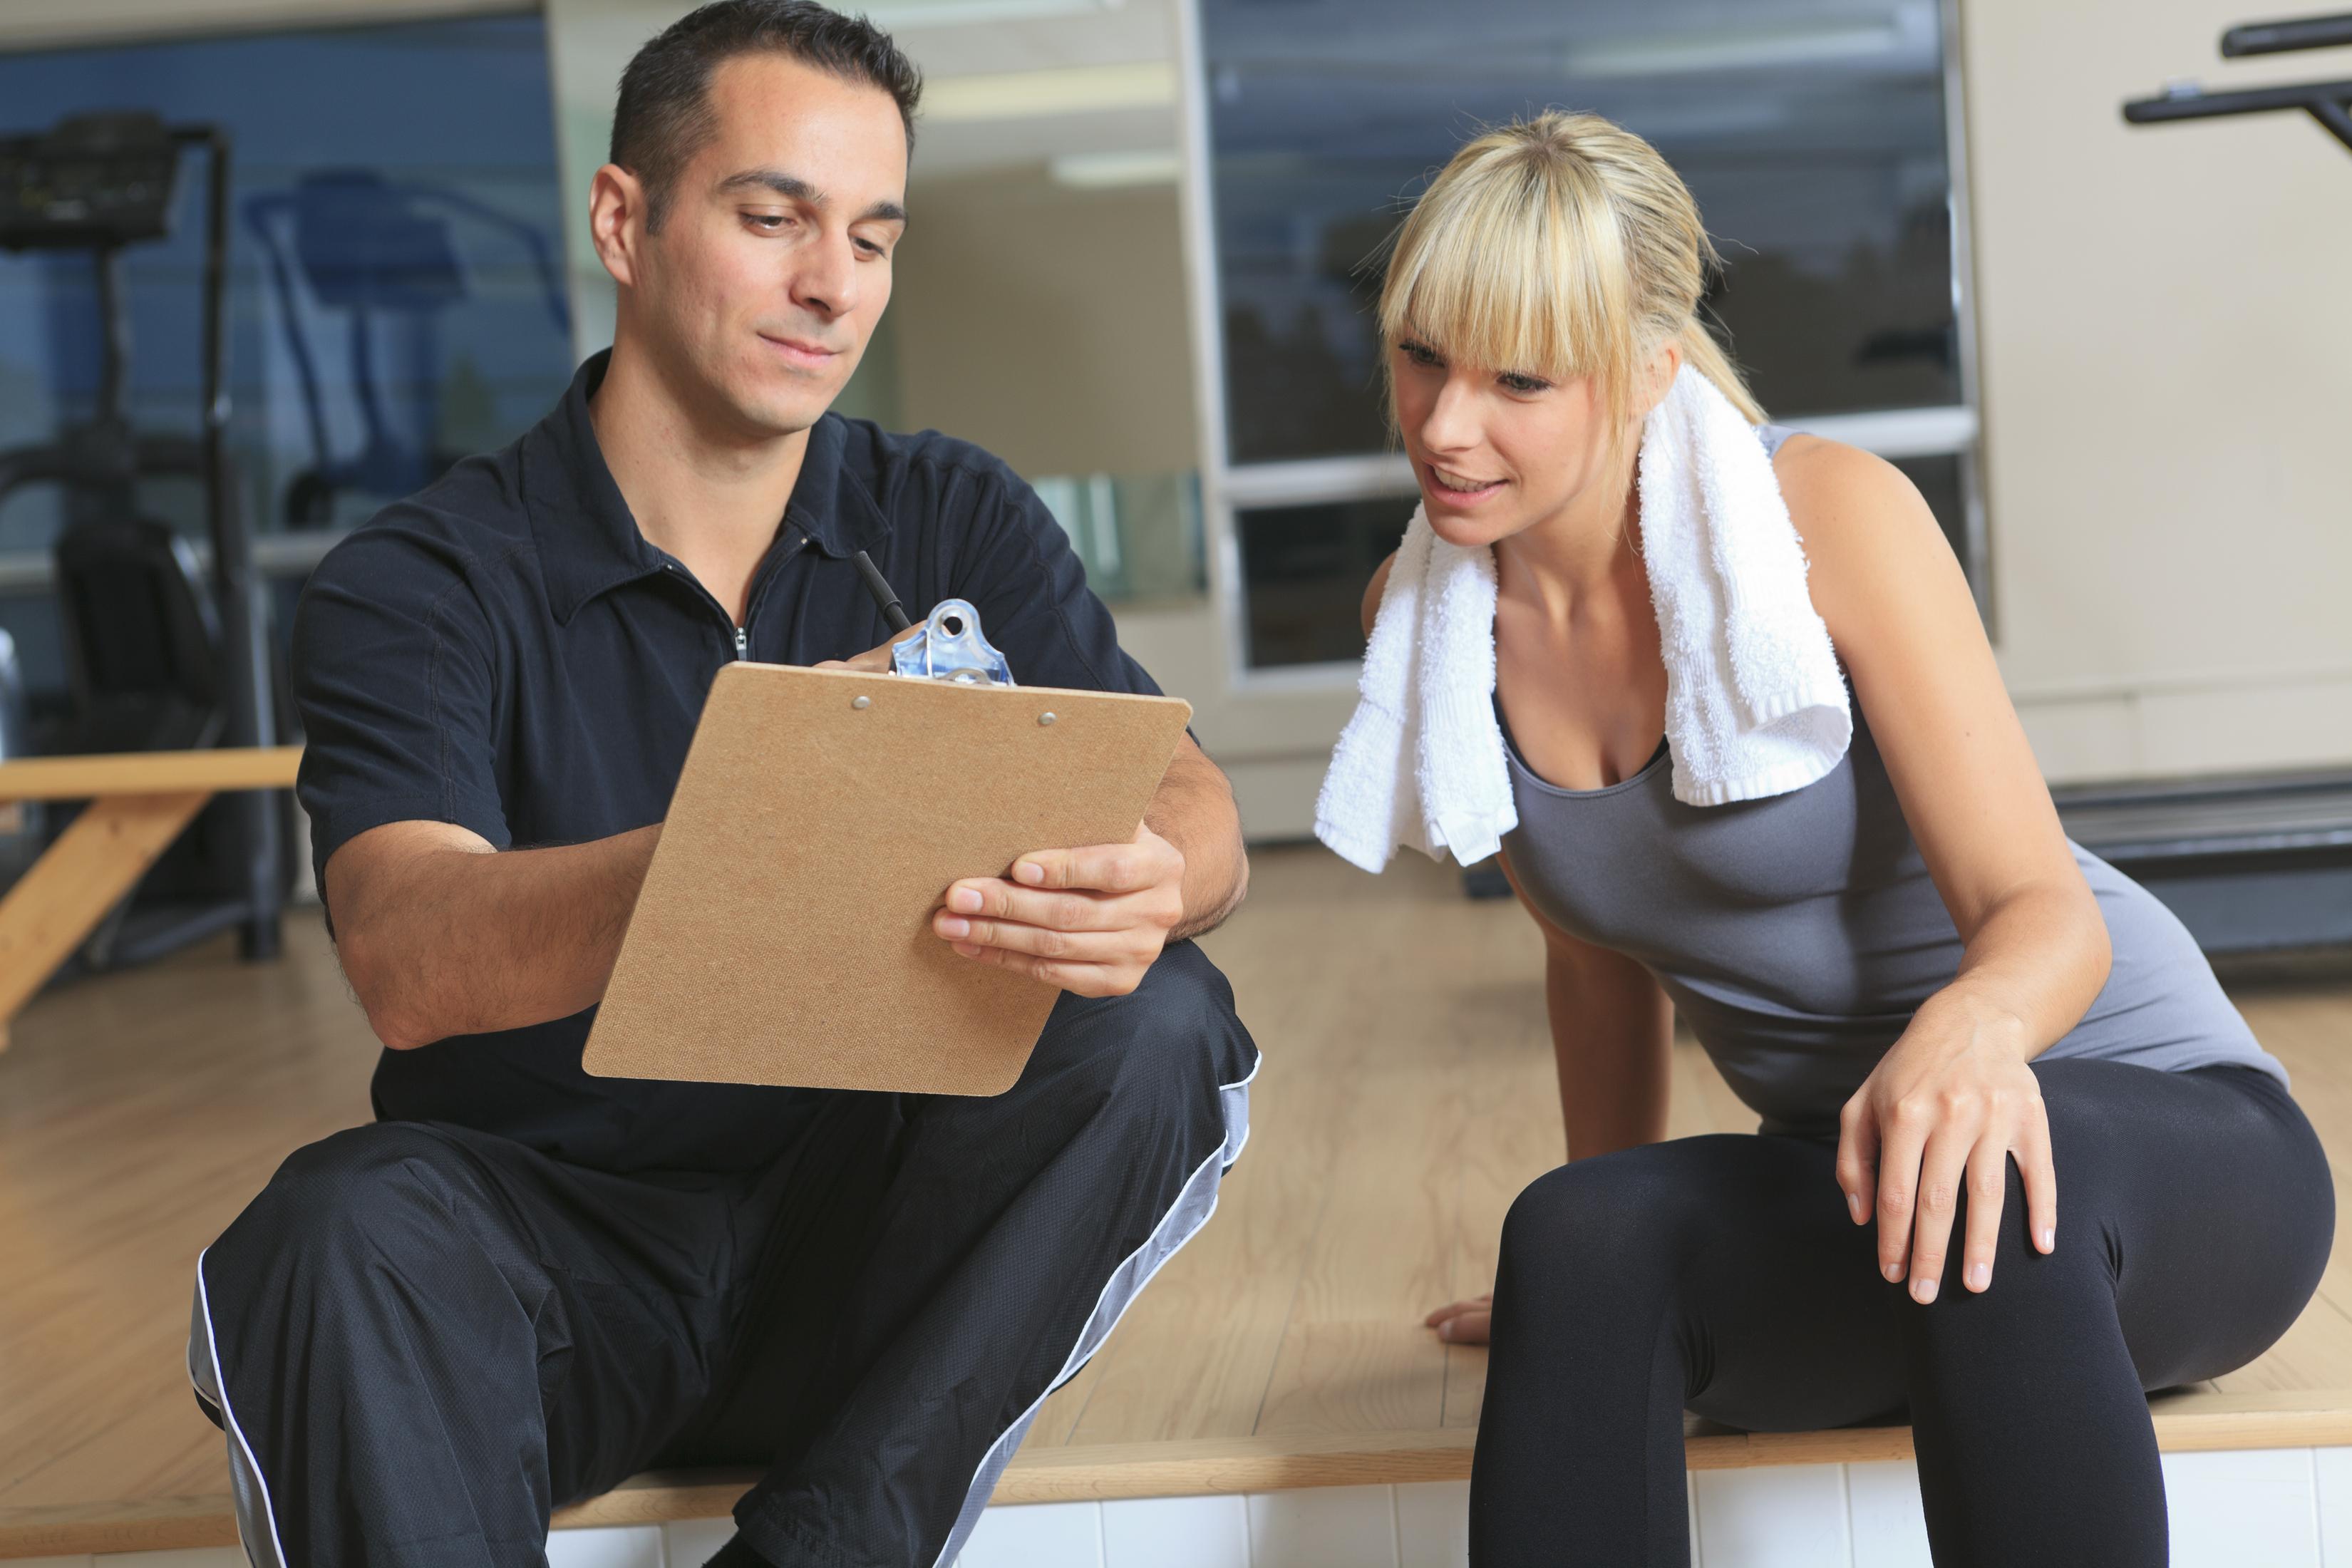 Contacter un conseiller Run&Workout